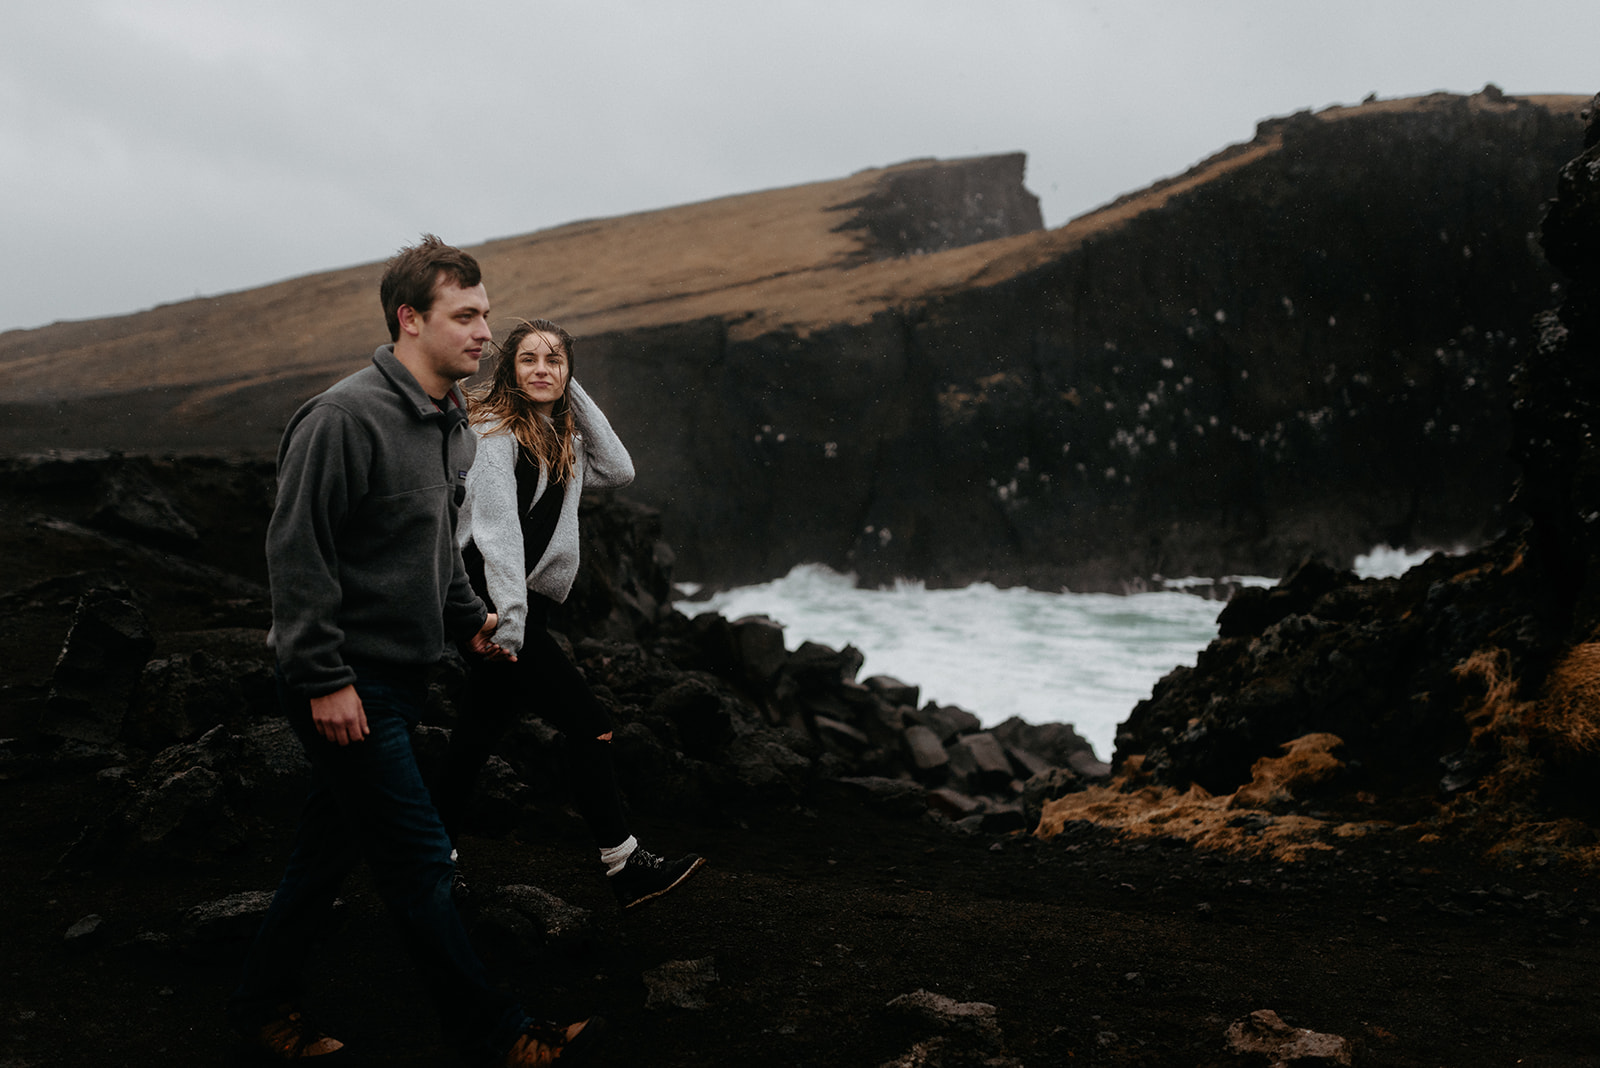 Mack & Michael - Sesja na Islandii 6 alebosco islandia mm 5